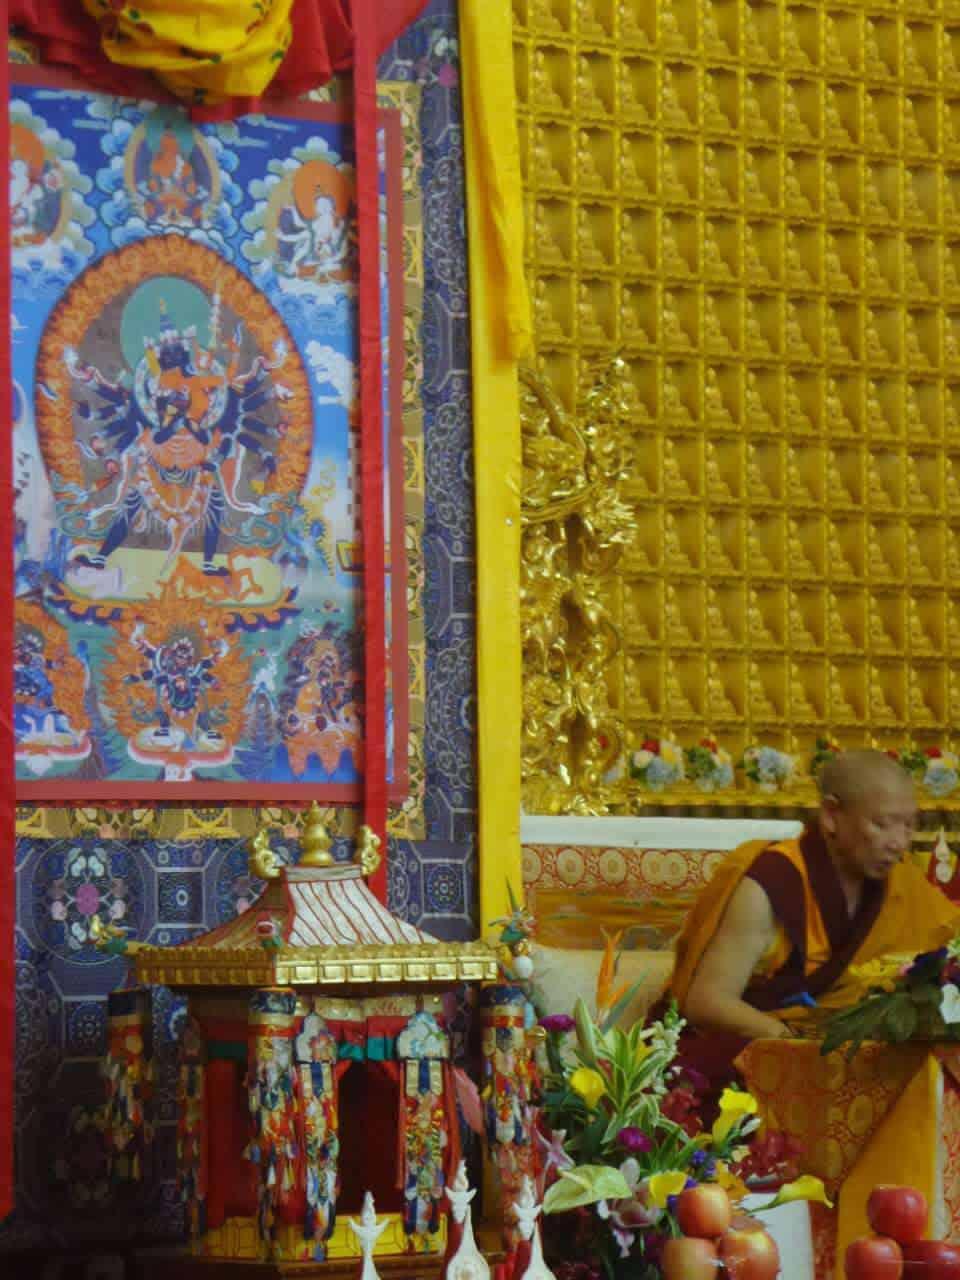 gosok-rinpoche-2016-10-215694223494253518